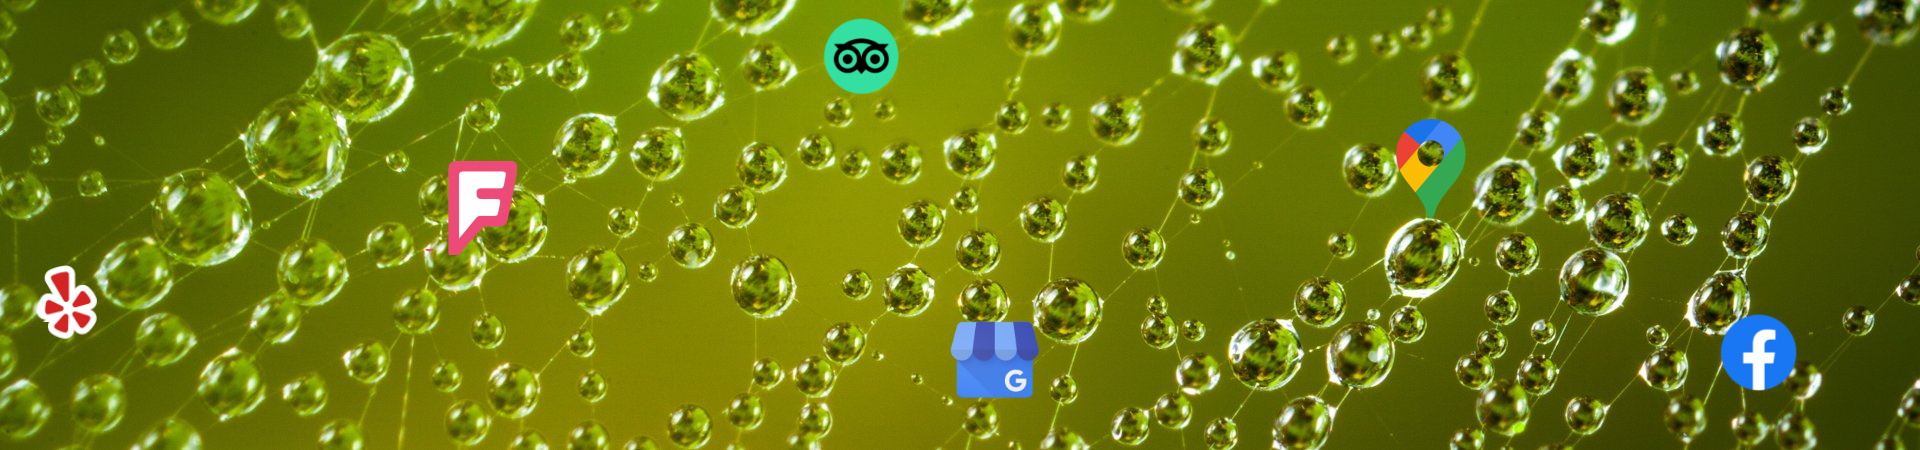 Linkbuilding & Citation websites om hoger in google te komen